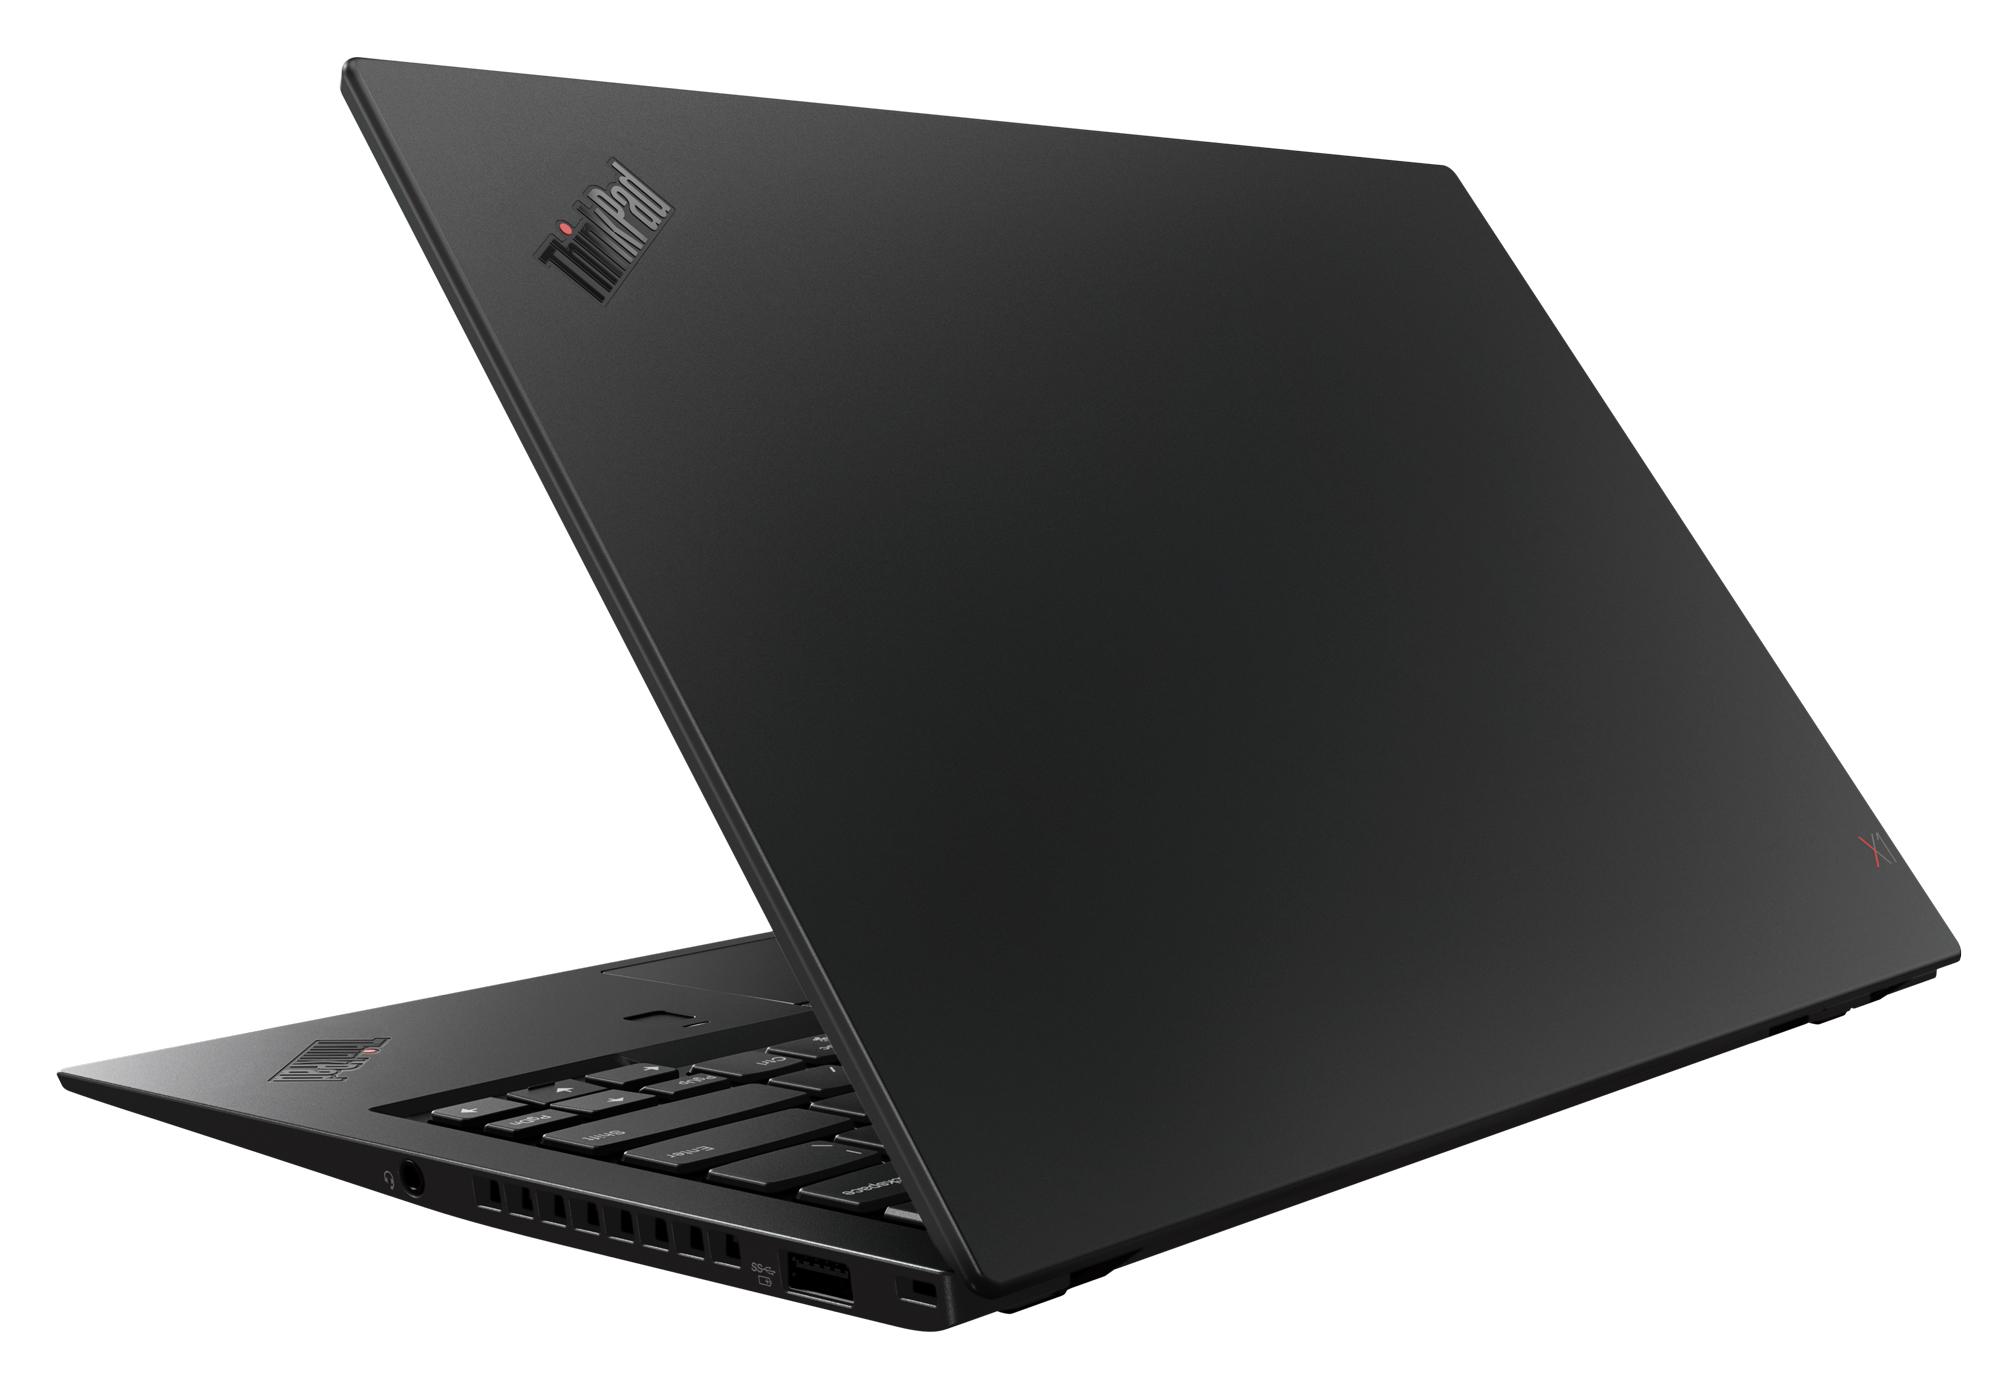 Фото  Ультрабук ThinkPad X1 Carbon 6th Gen (20KH006HRT)